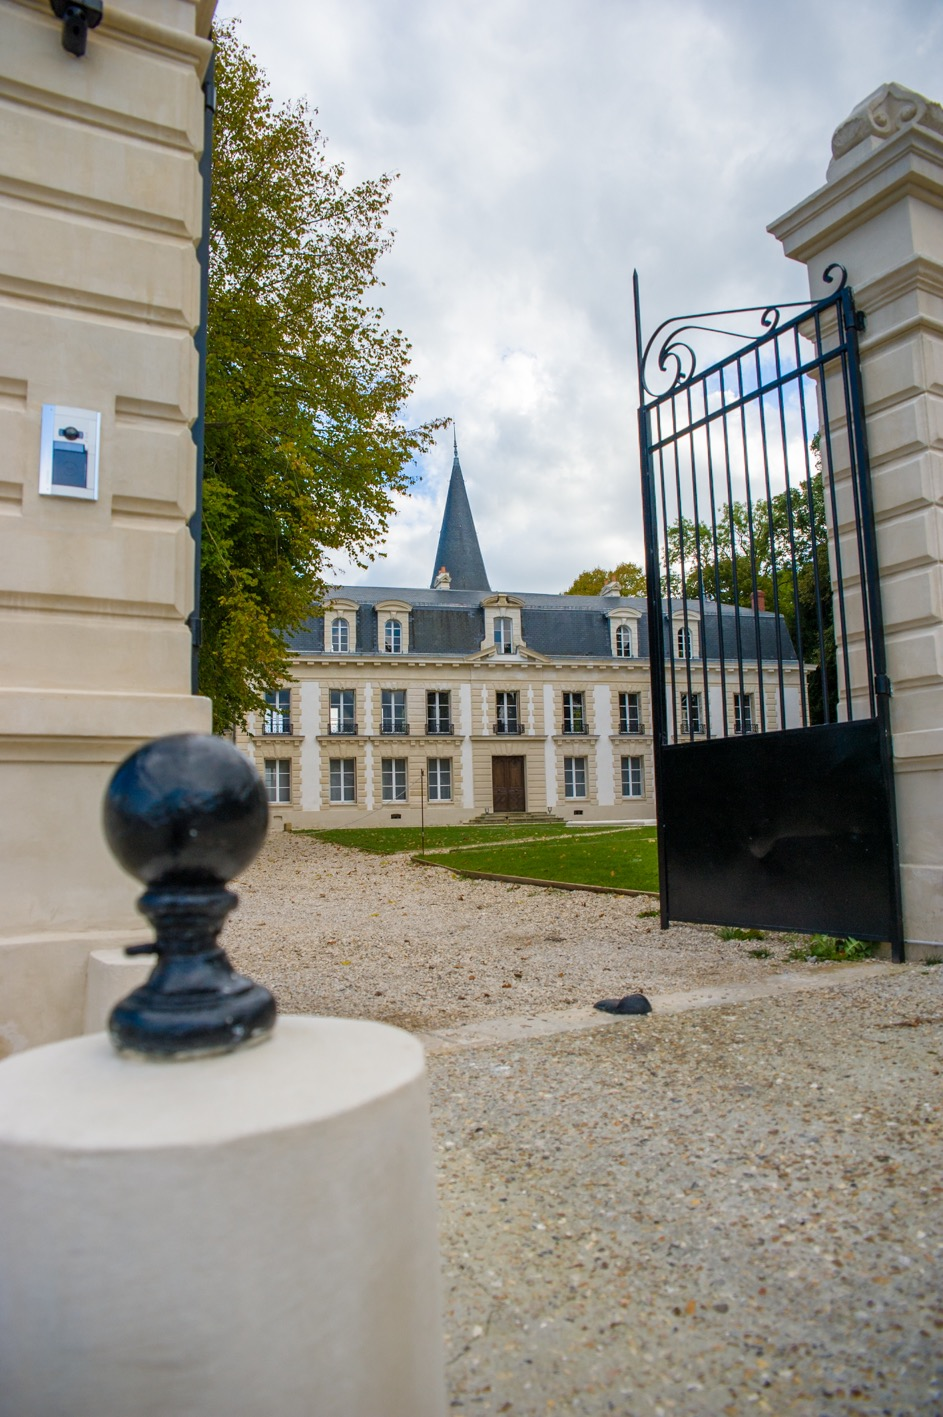 porte ext chateau 2.jpg